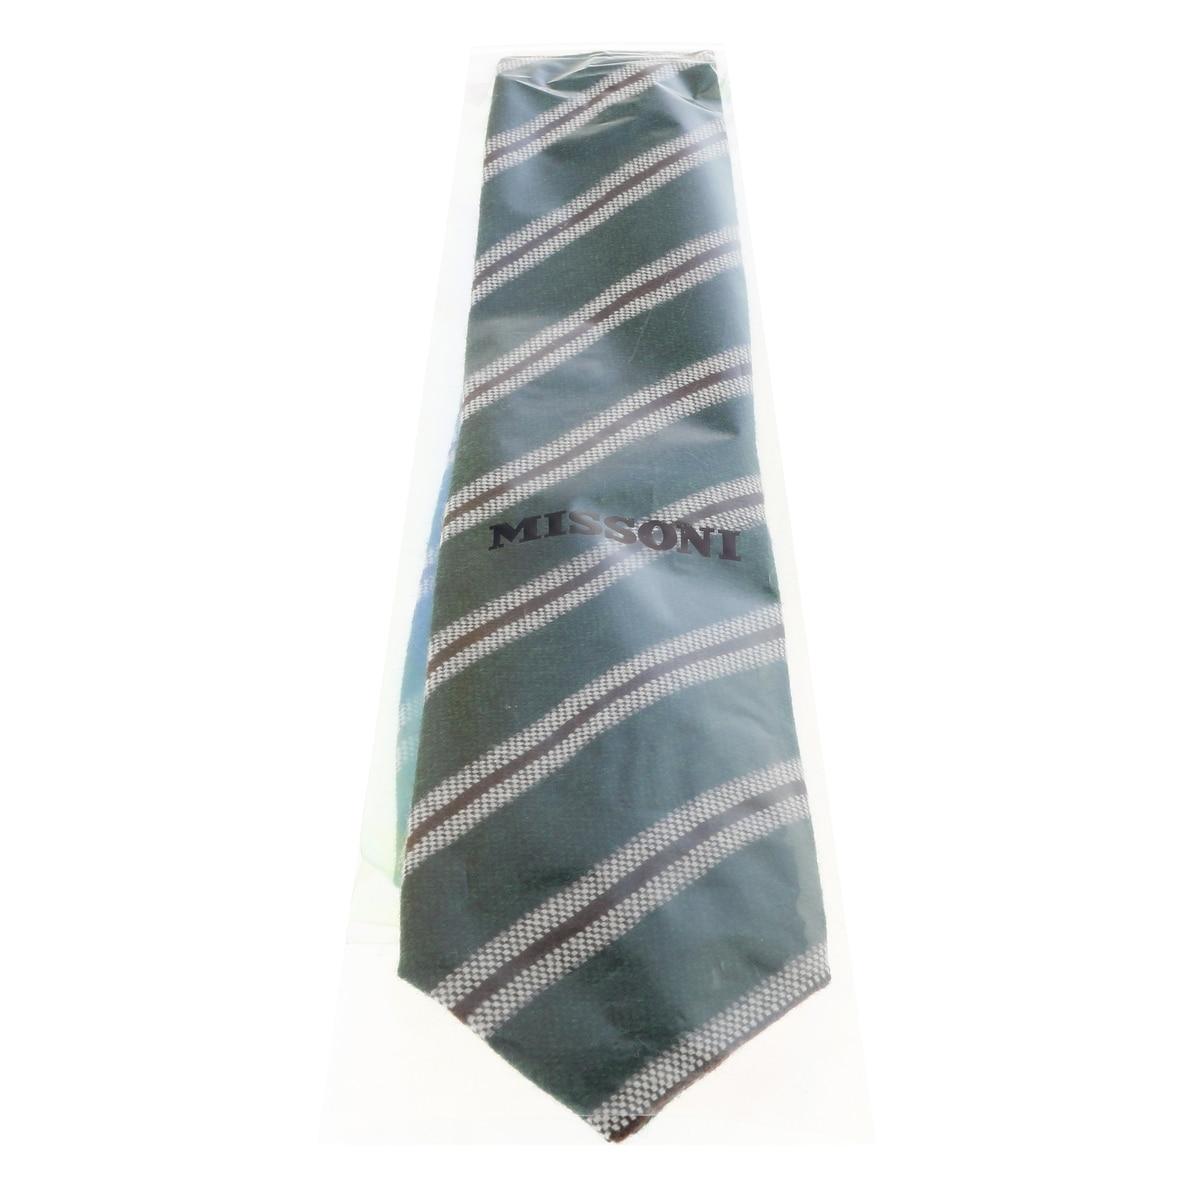 Missoni U5145 Grey//Navy Regimental 100/% Silk Tie for mens